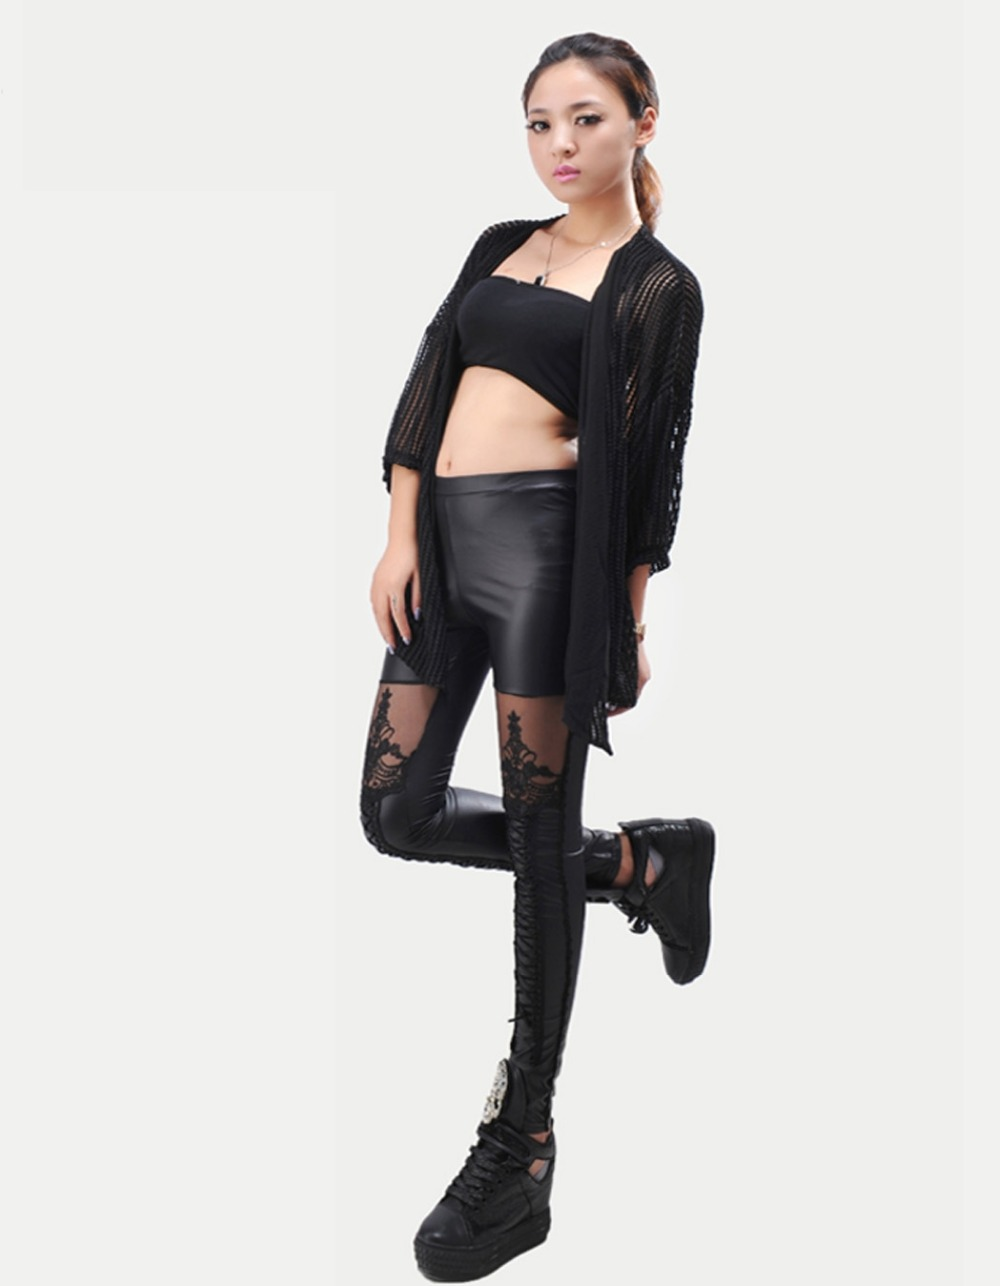 Black Legins Punk Gothic Fashion Women Leggings Sexy PU Leather Stitching Embroidery Hollow Lace Legging For Women Leggins 15 9